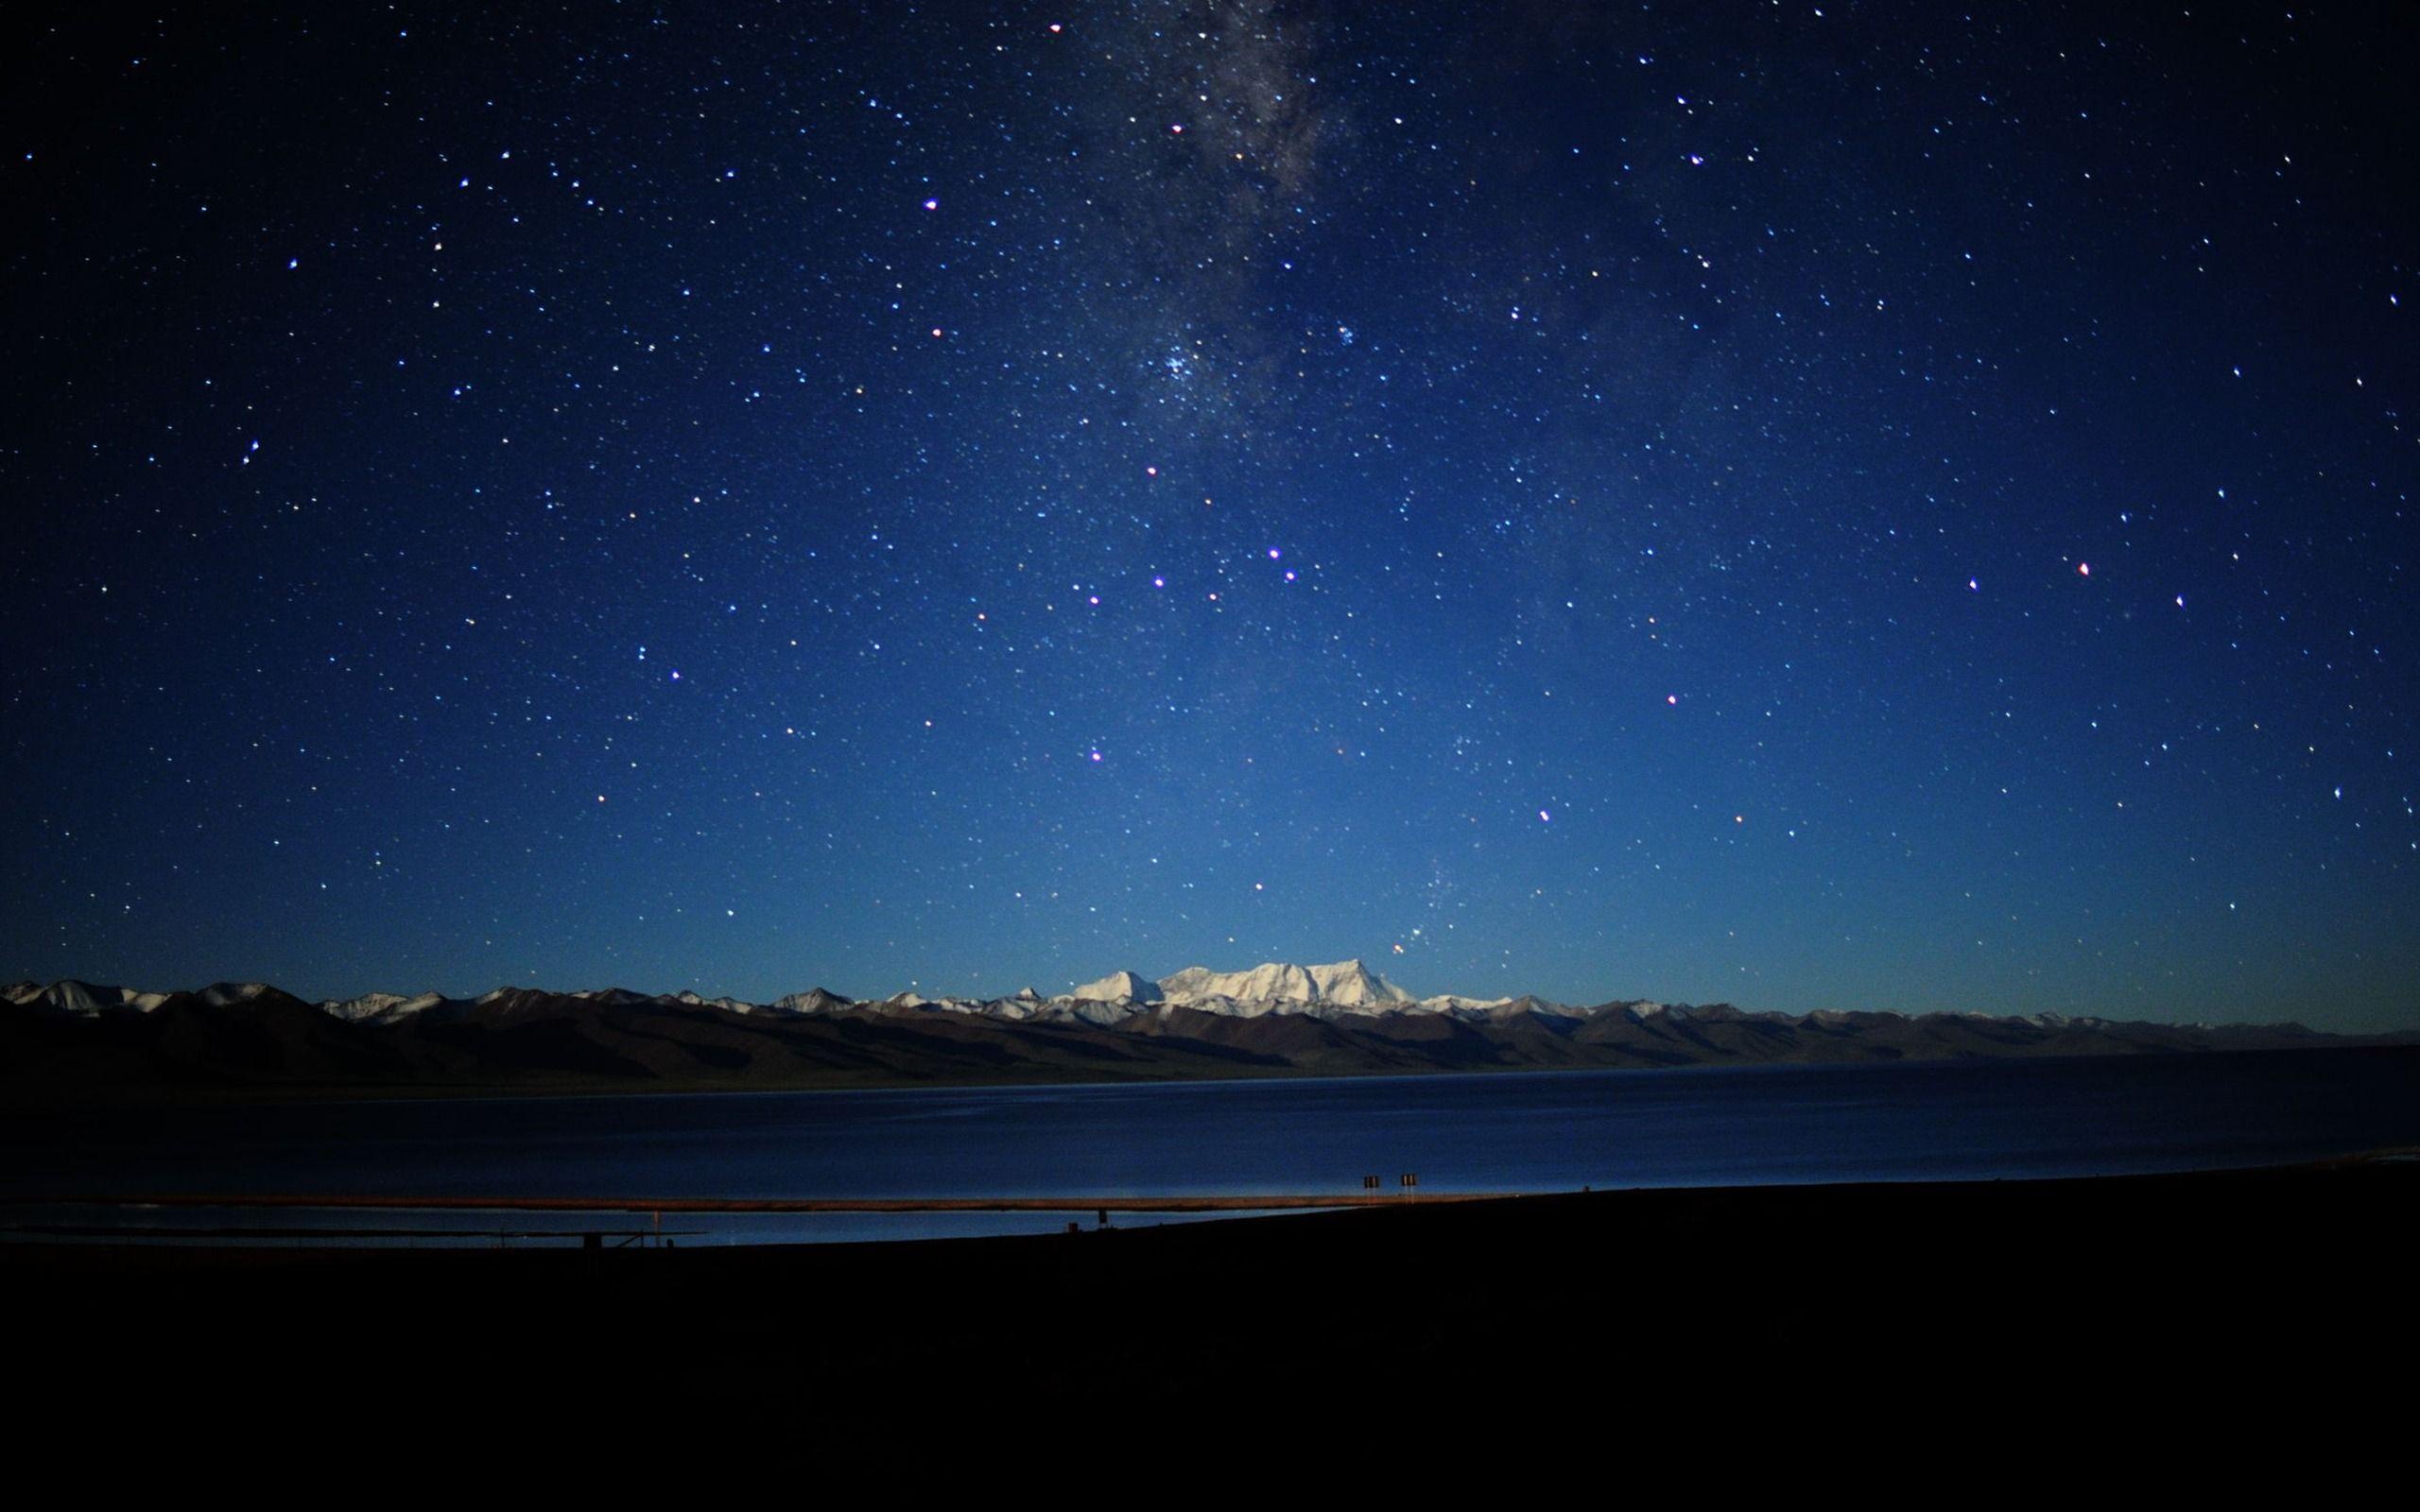 Night Sky Wallpapers